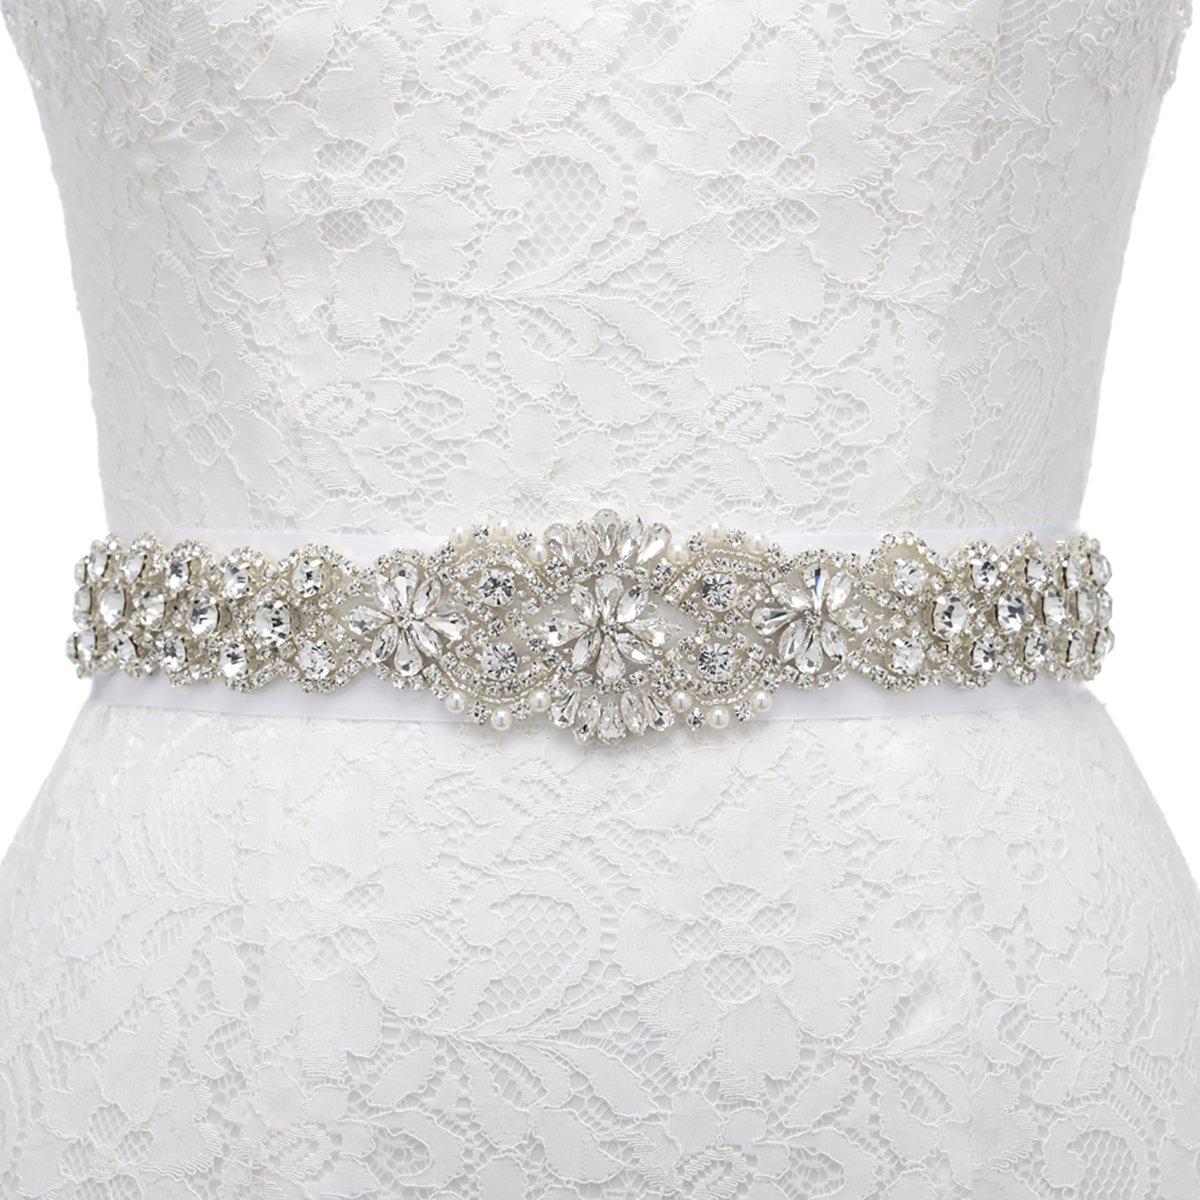 Remedios Sparkling Rhinestone Satin Ribbon Sash Belt for Bride Bridesmaid Dress ,White